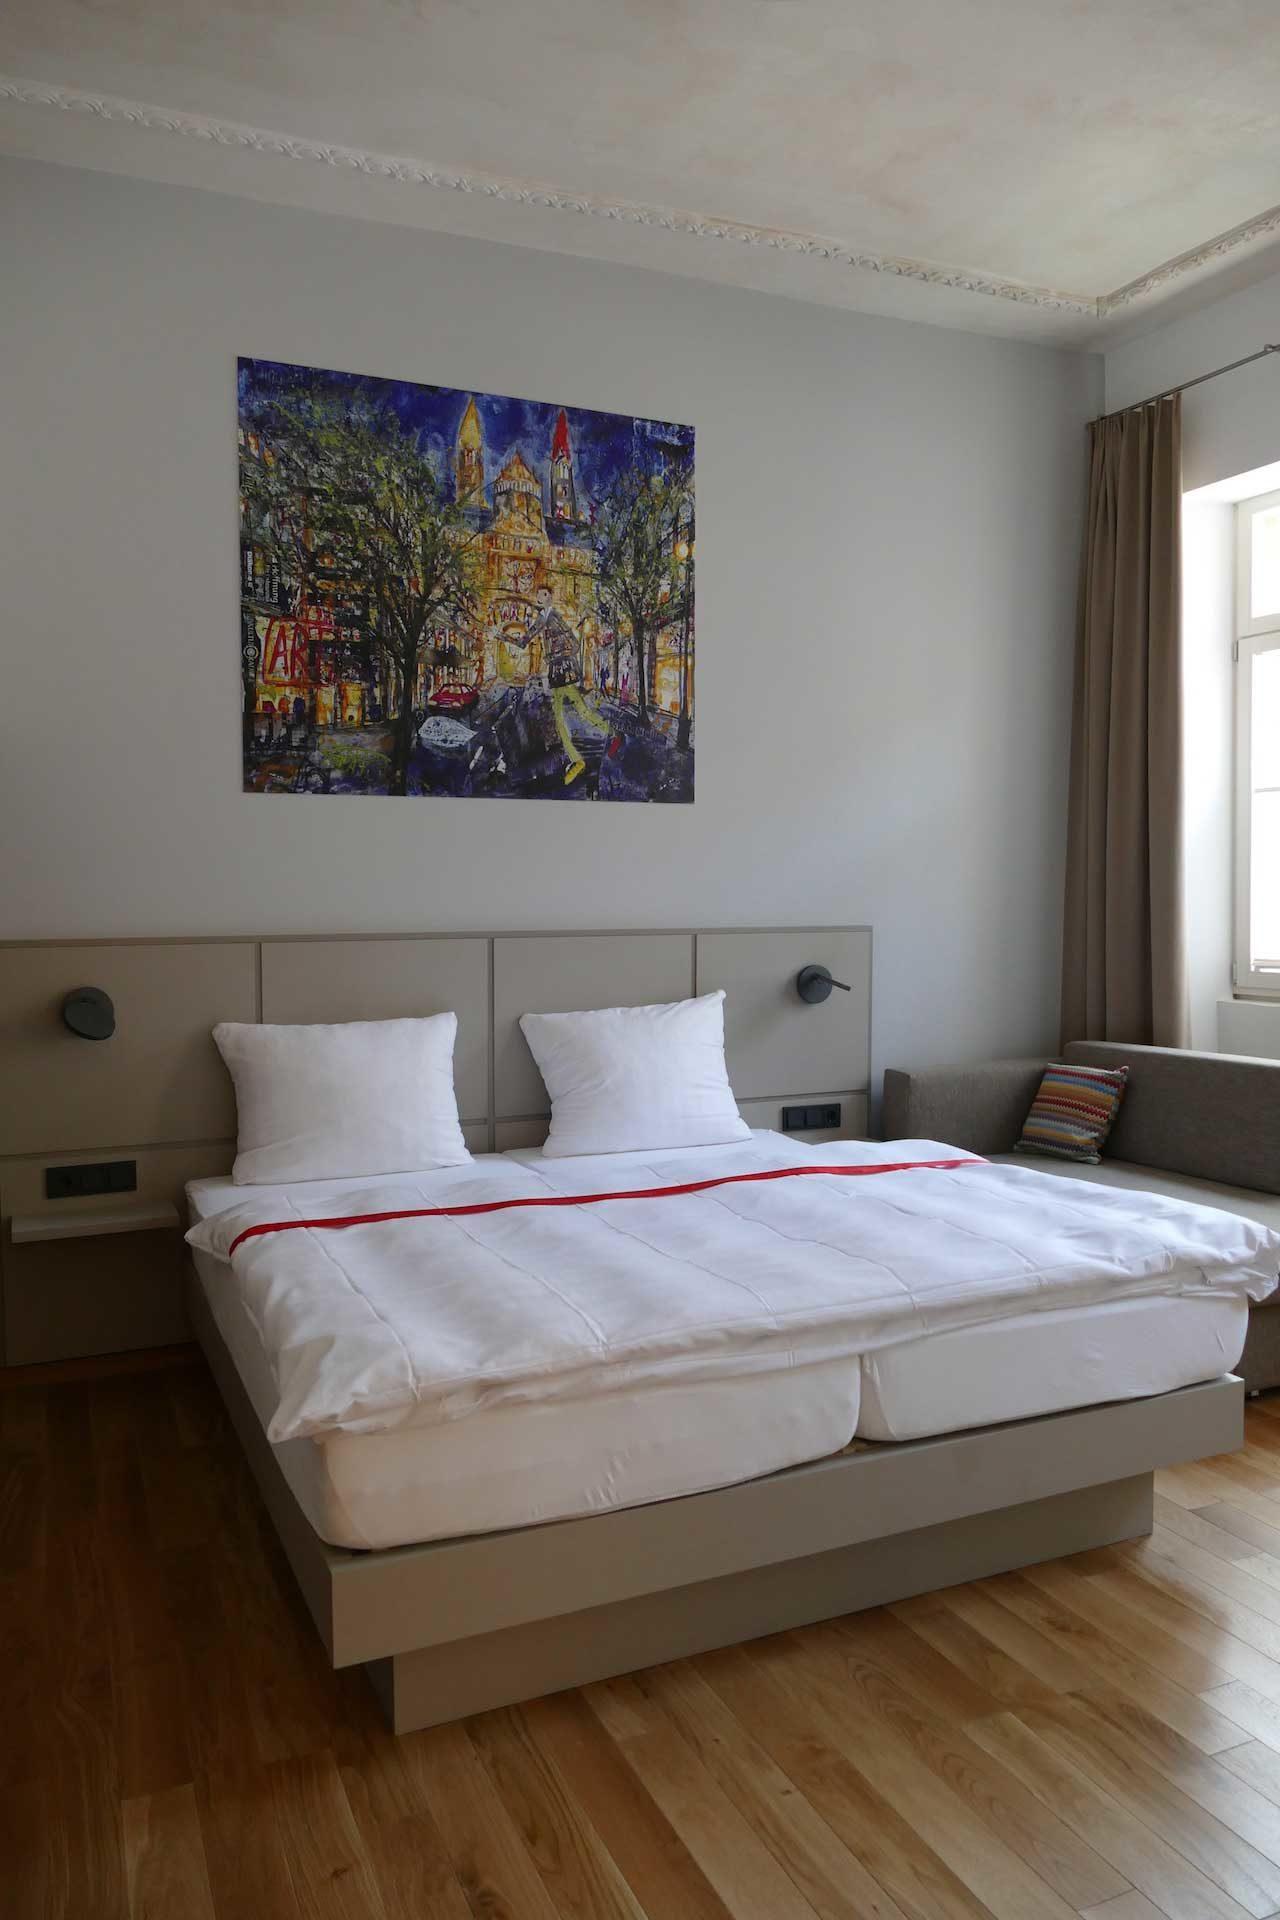 Gästehaus maximilian Speyer